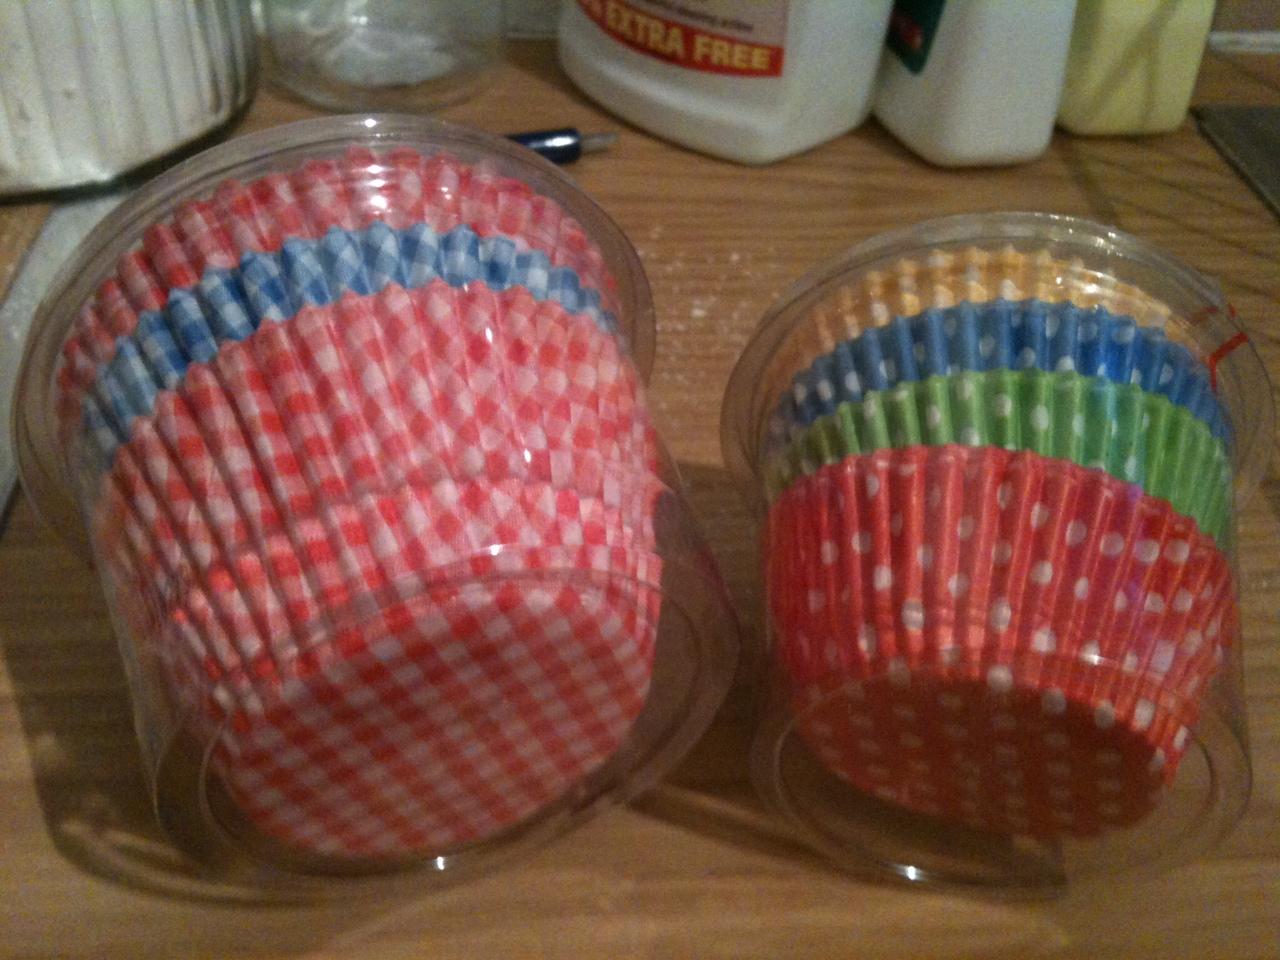 Cake Decorating Beeston : Exciting baking supplies shopping trip!*% Kerry Cooks